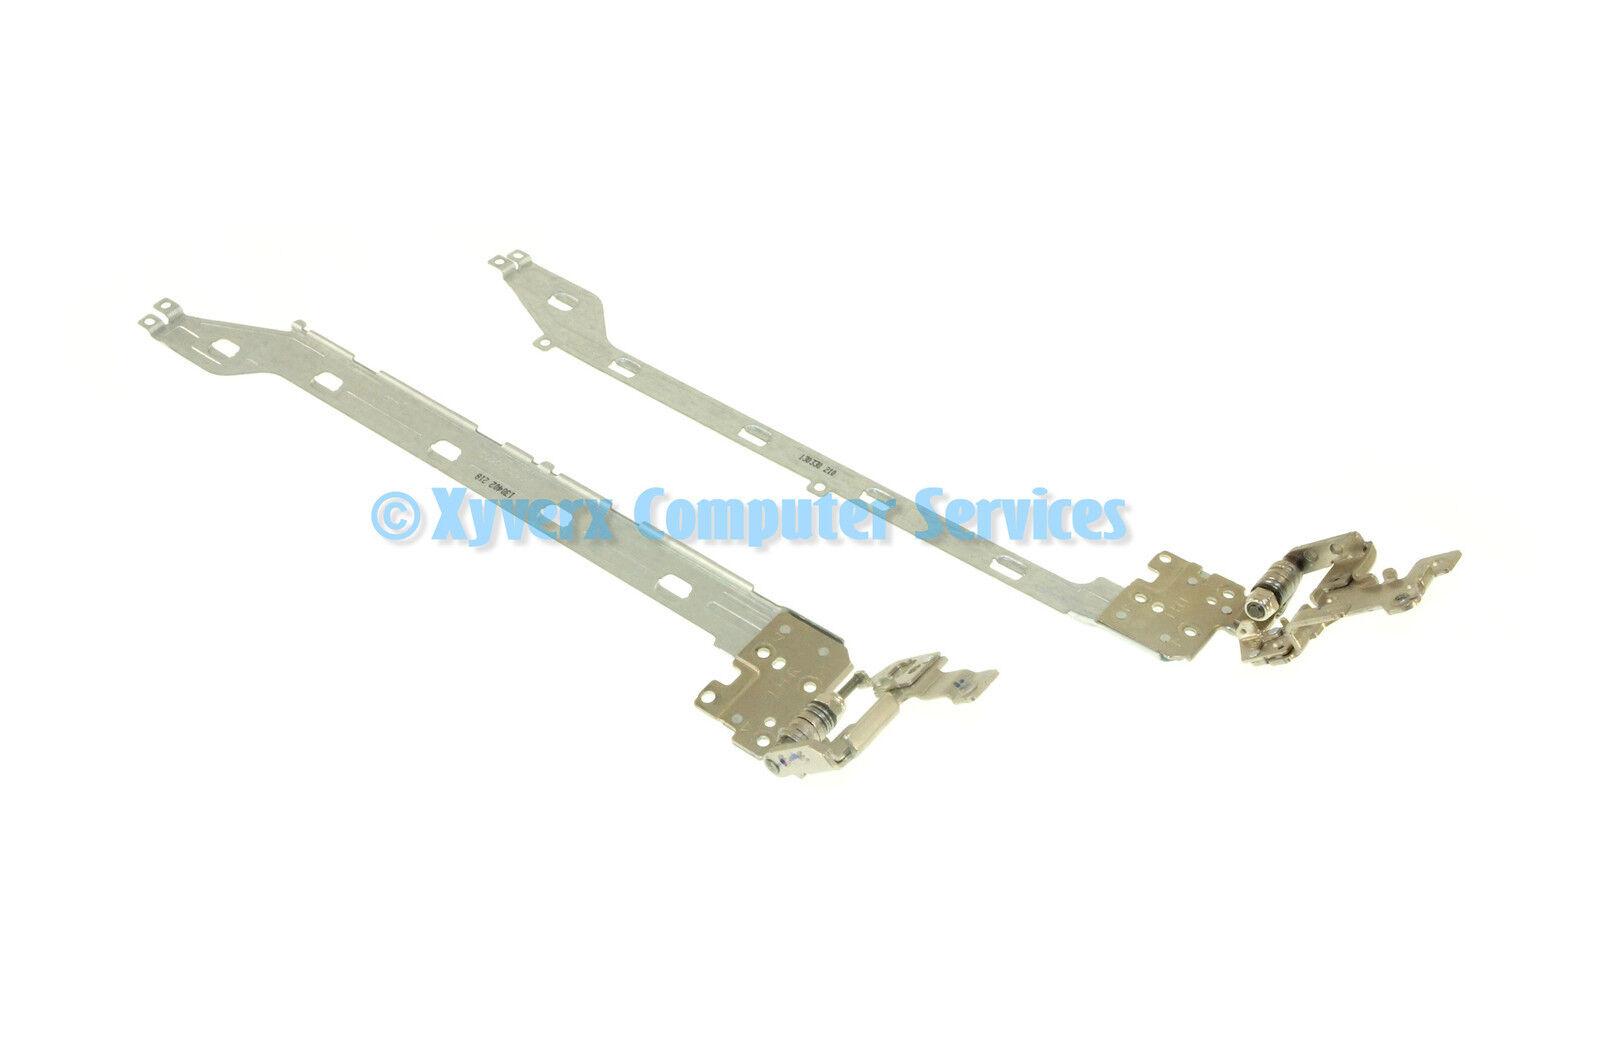 AM0SZ000600 AM0SZ000500 GENUINE ORIGINAL DELL LCD HINGE KIT INSPIRON 15R-5537